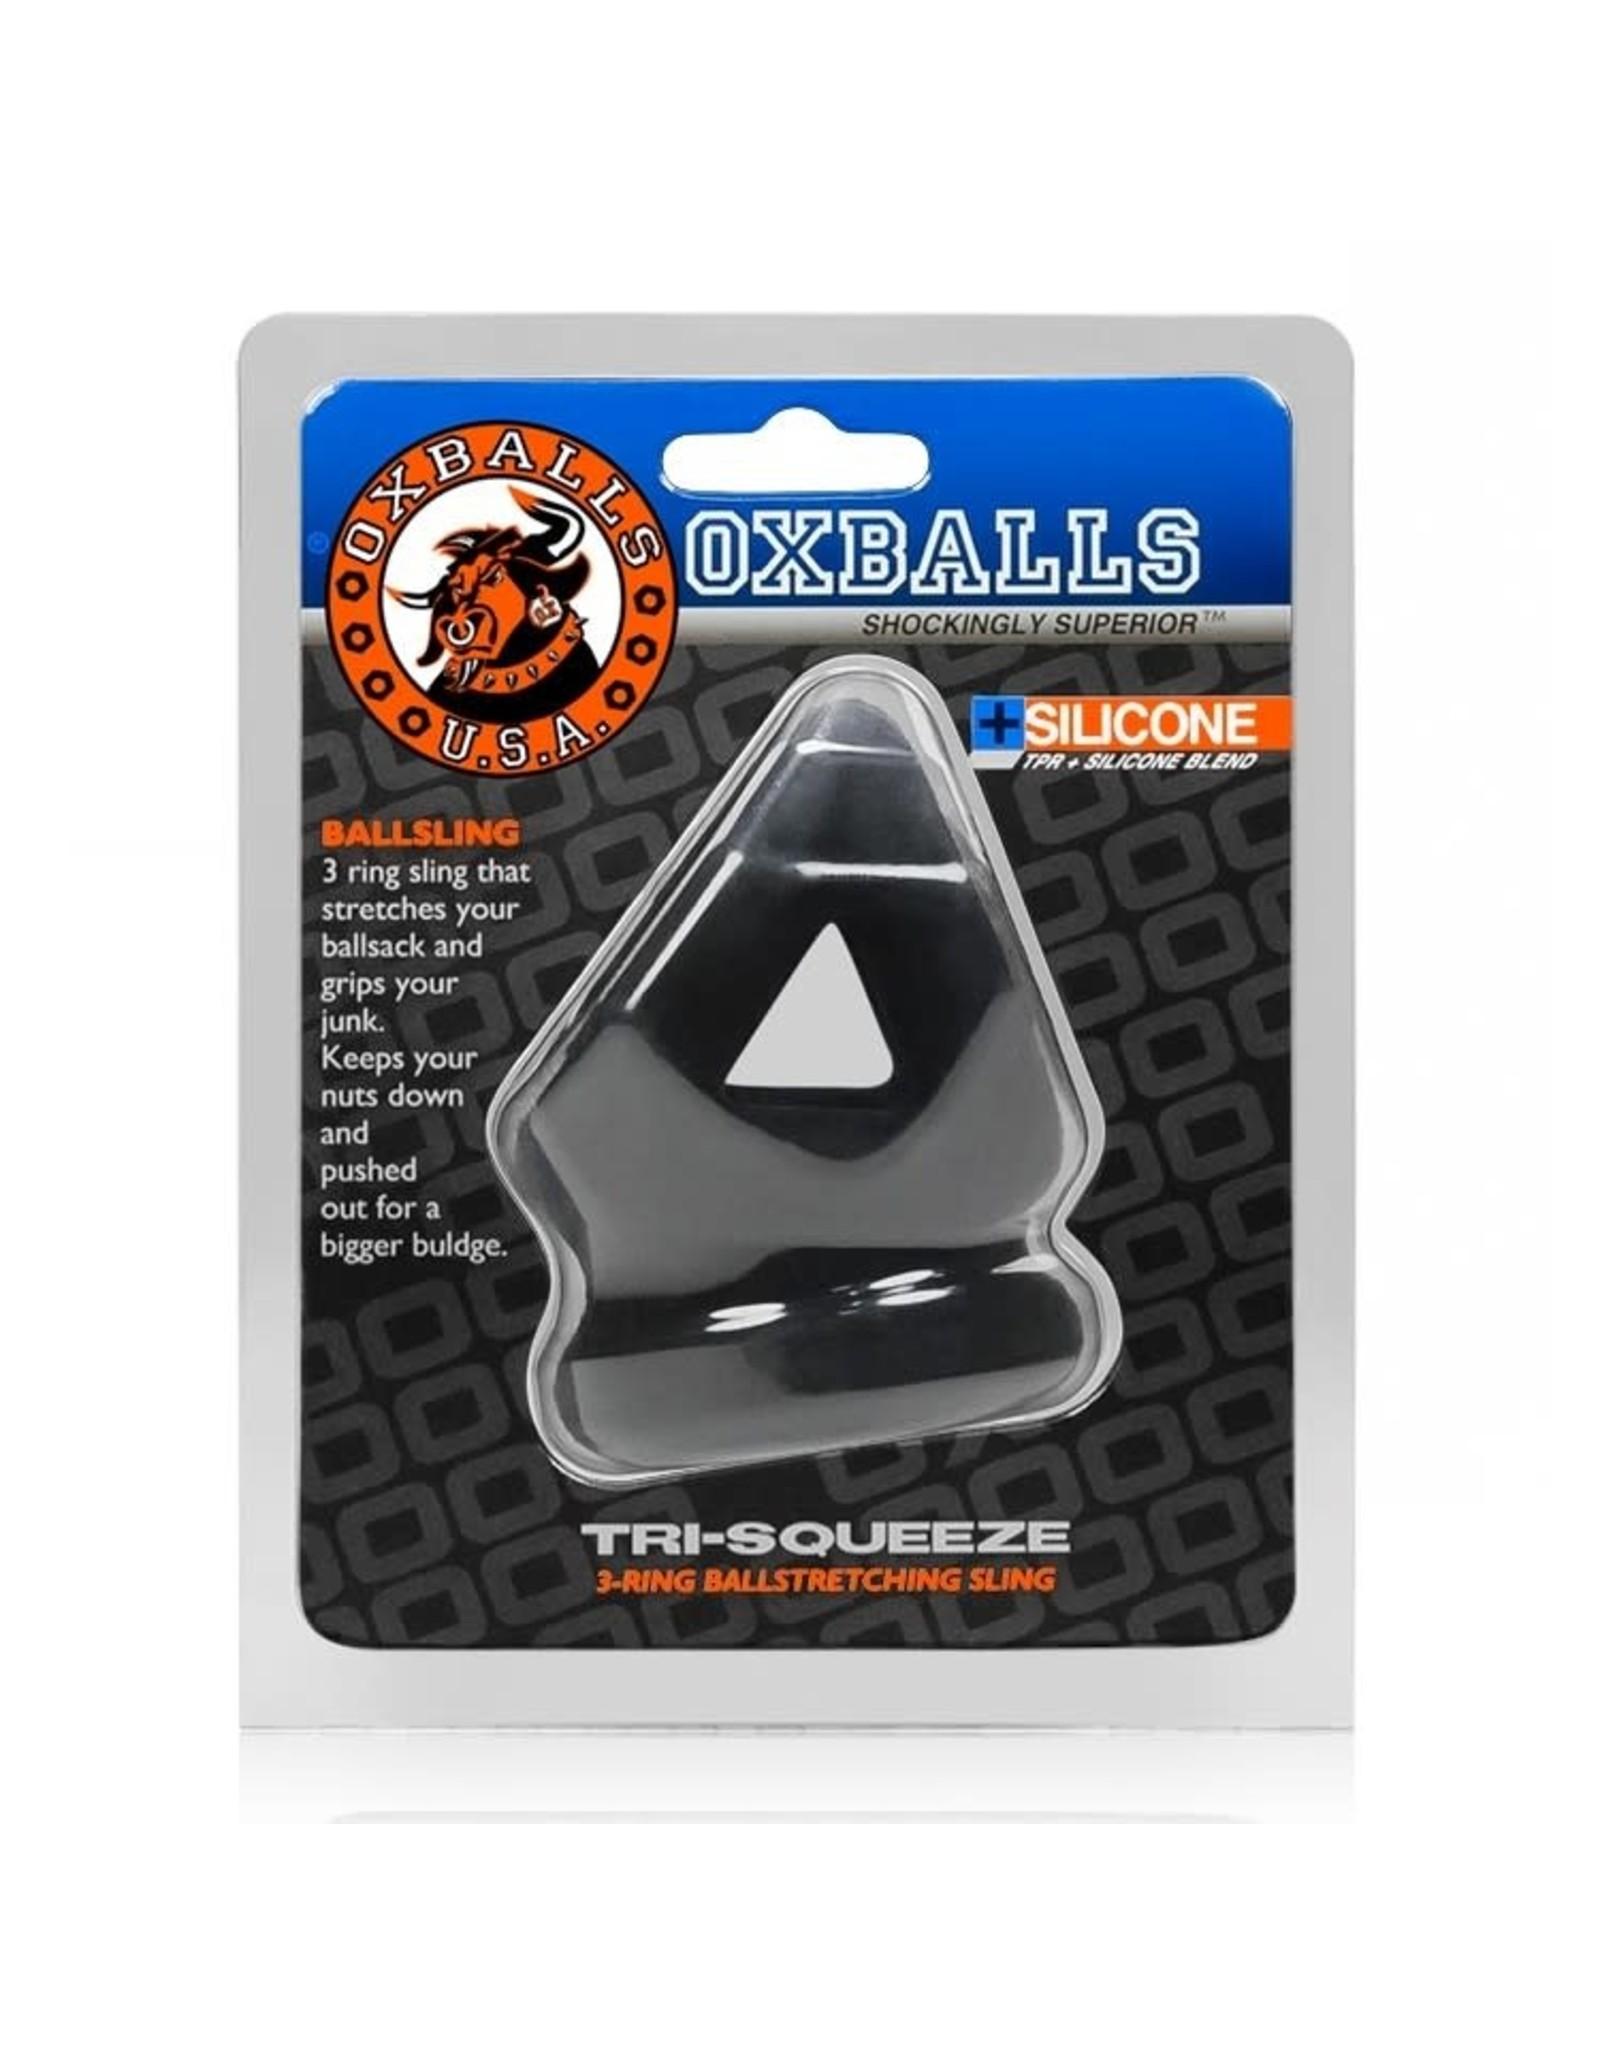 Oxballs OxBalls Tri-Squeeze Cocksling Ball Stretcher